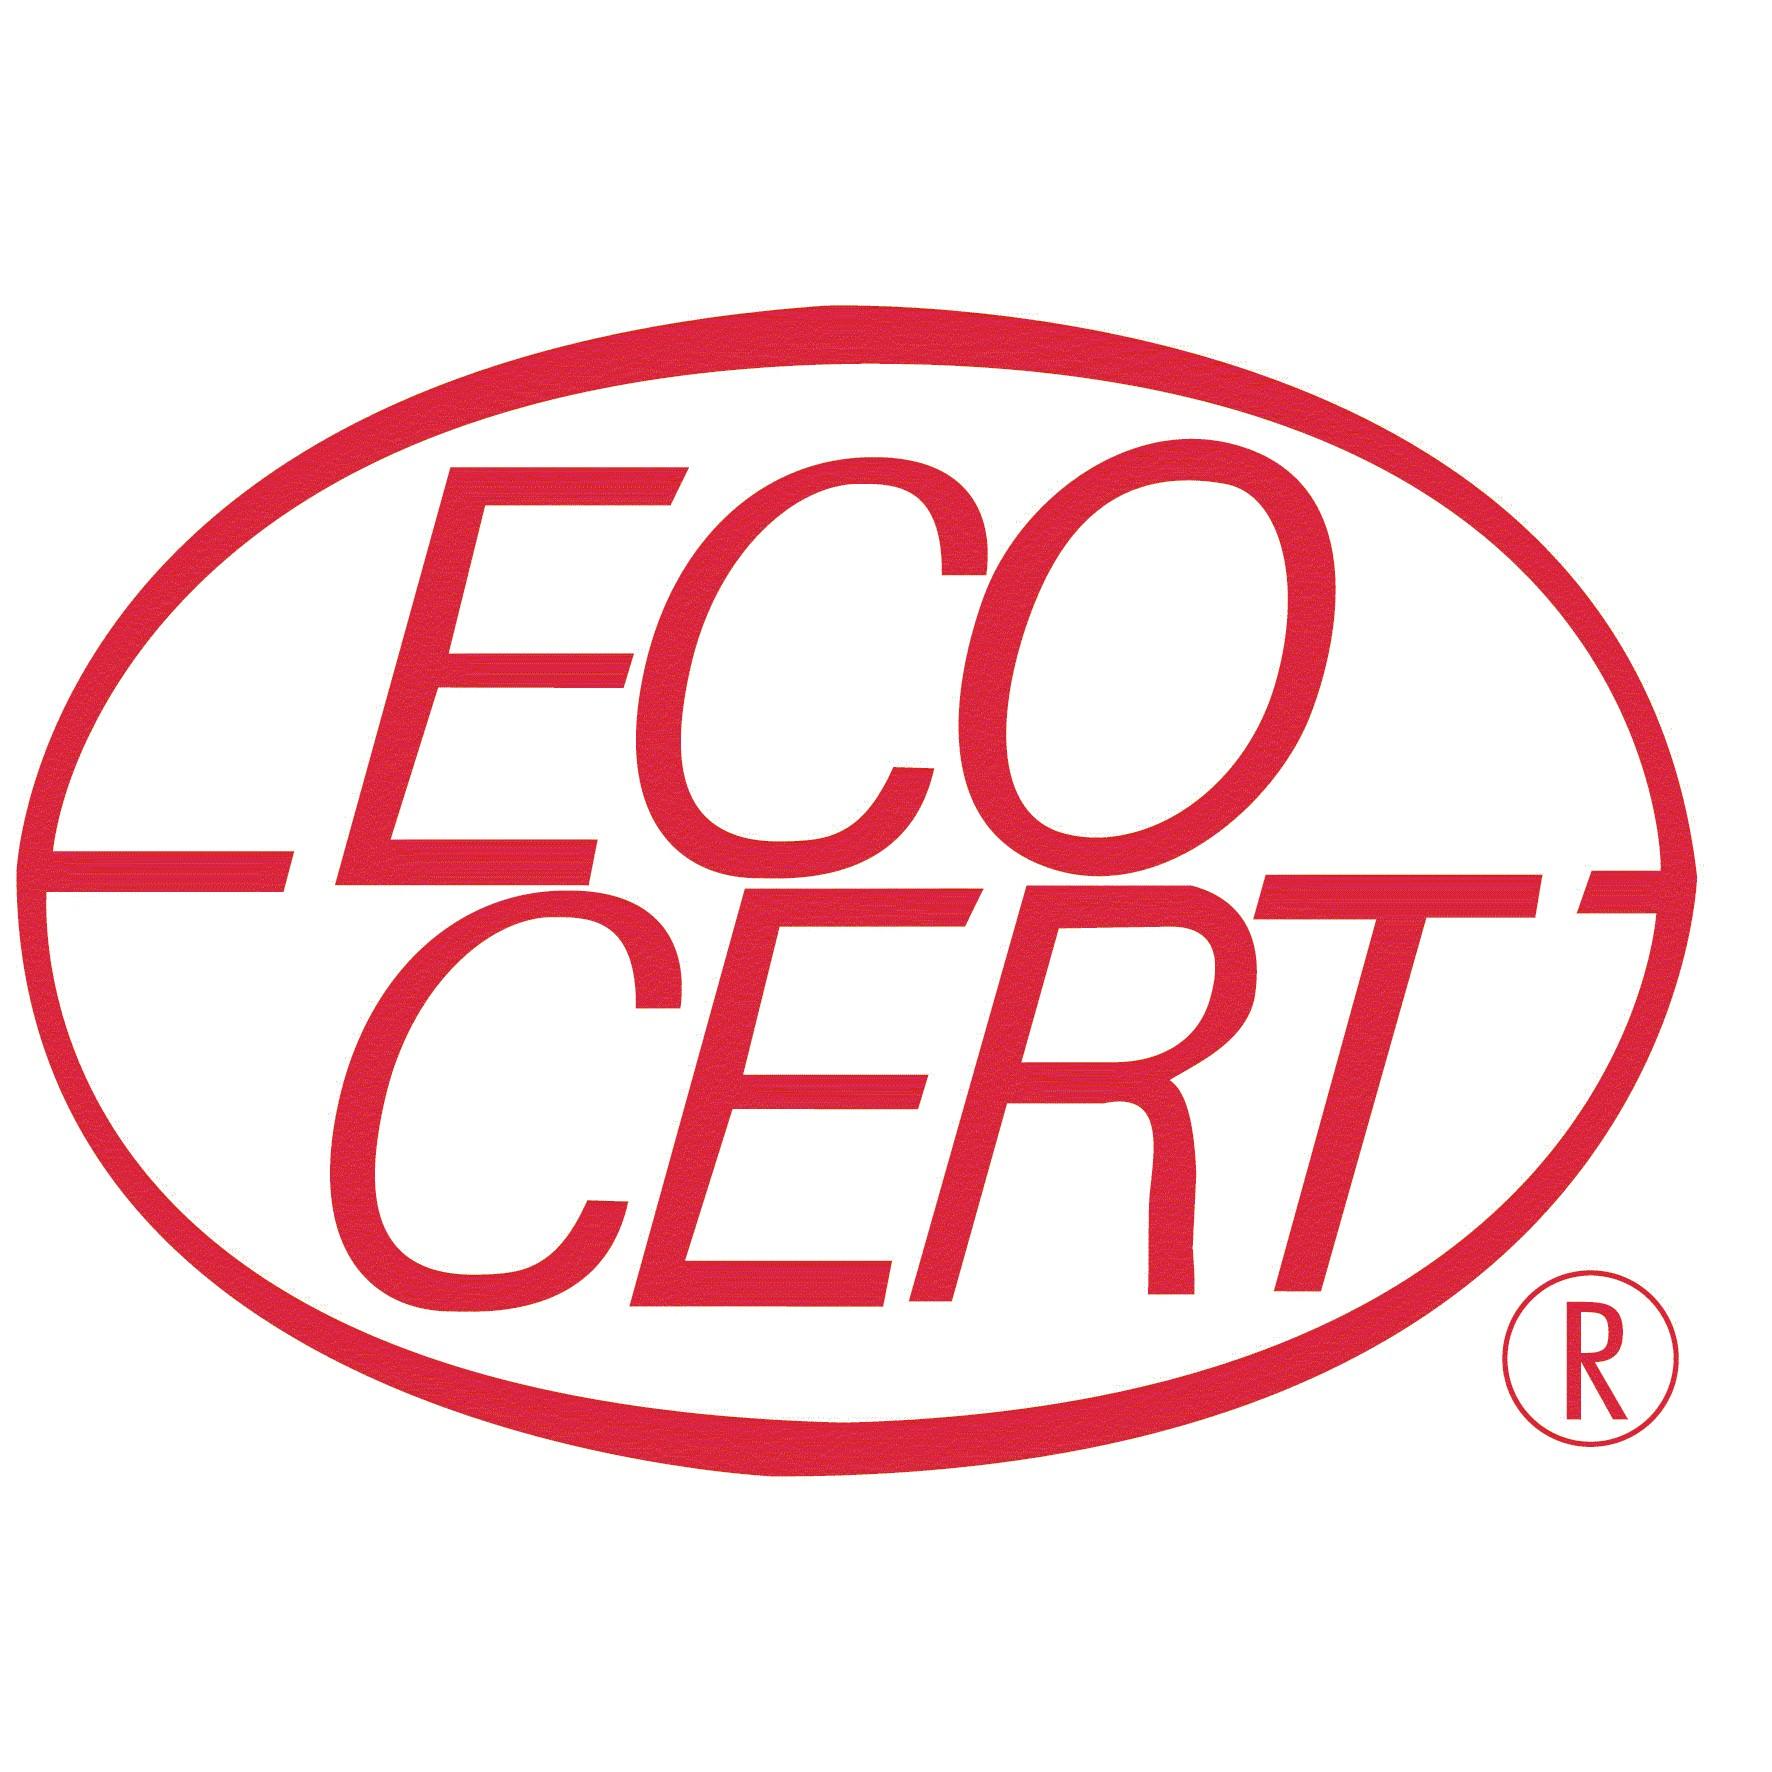 Ecocert Canada